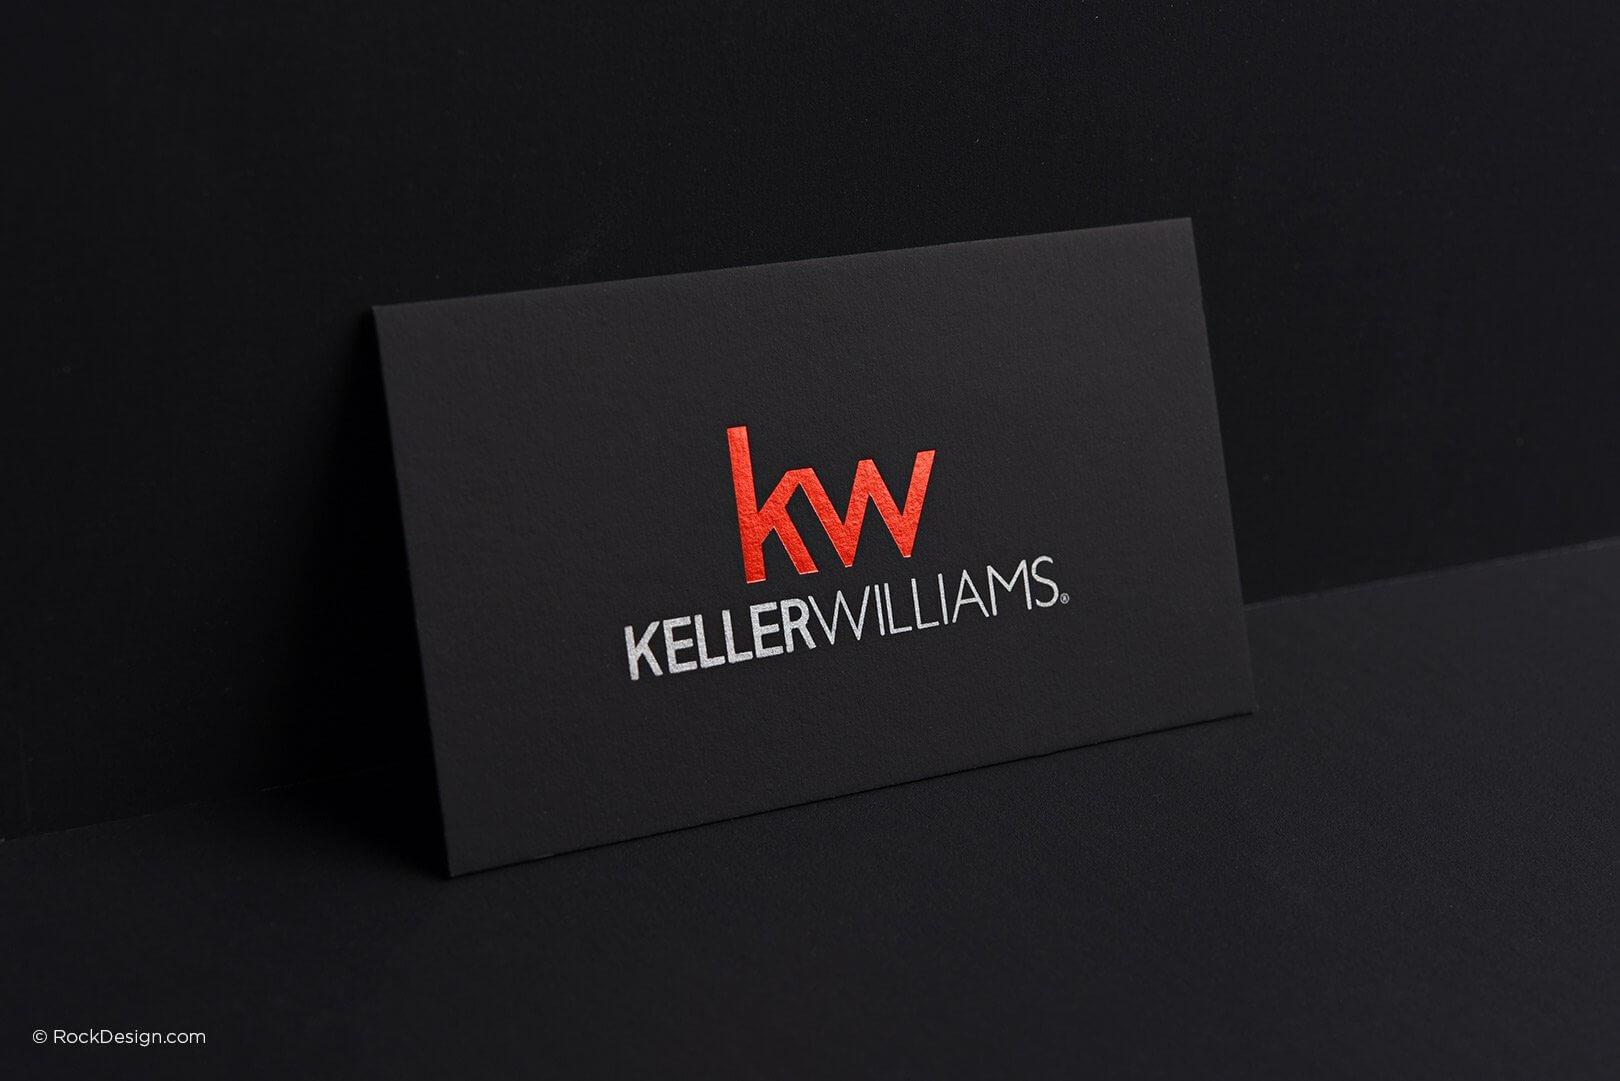 Free Keller Williams Business Card Template With Print In Keller Williams Business Card Templates